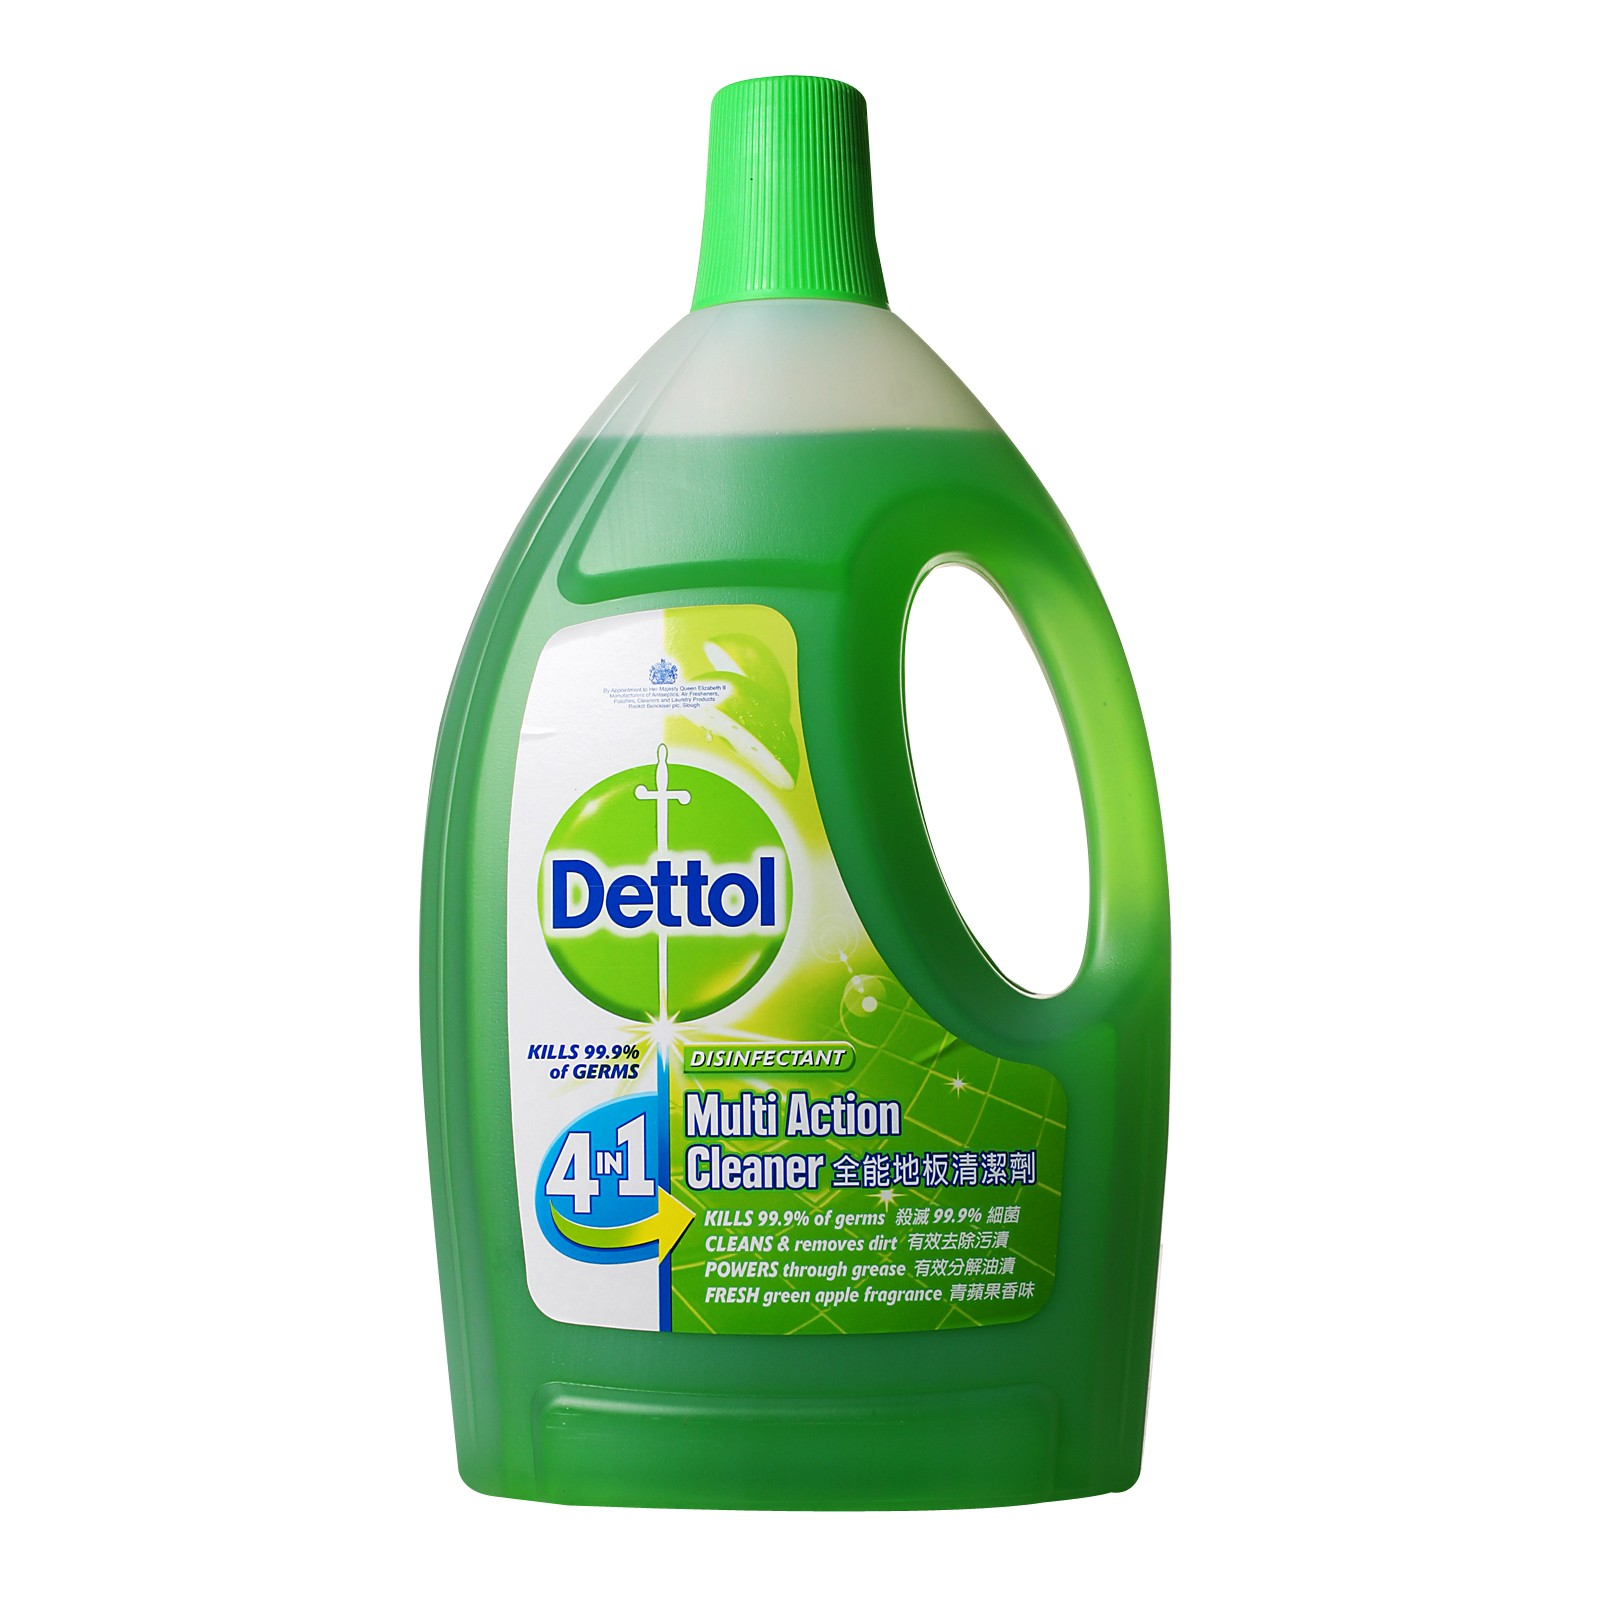 INTAN FAZNITA HAJI SAMUDI DETTOL Germ Protection